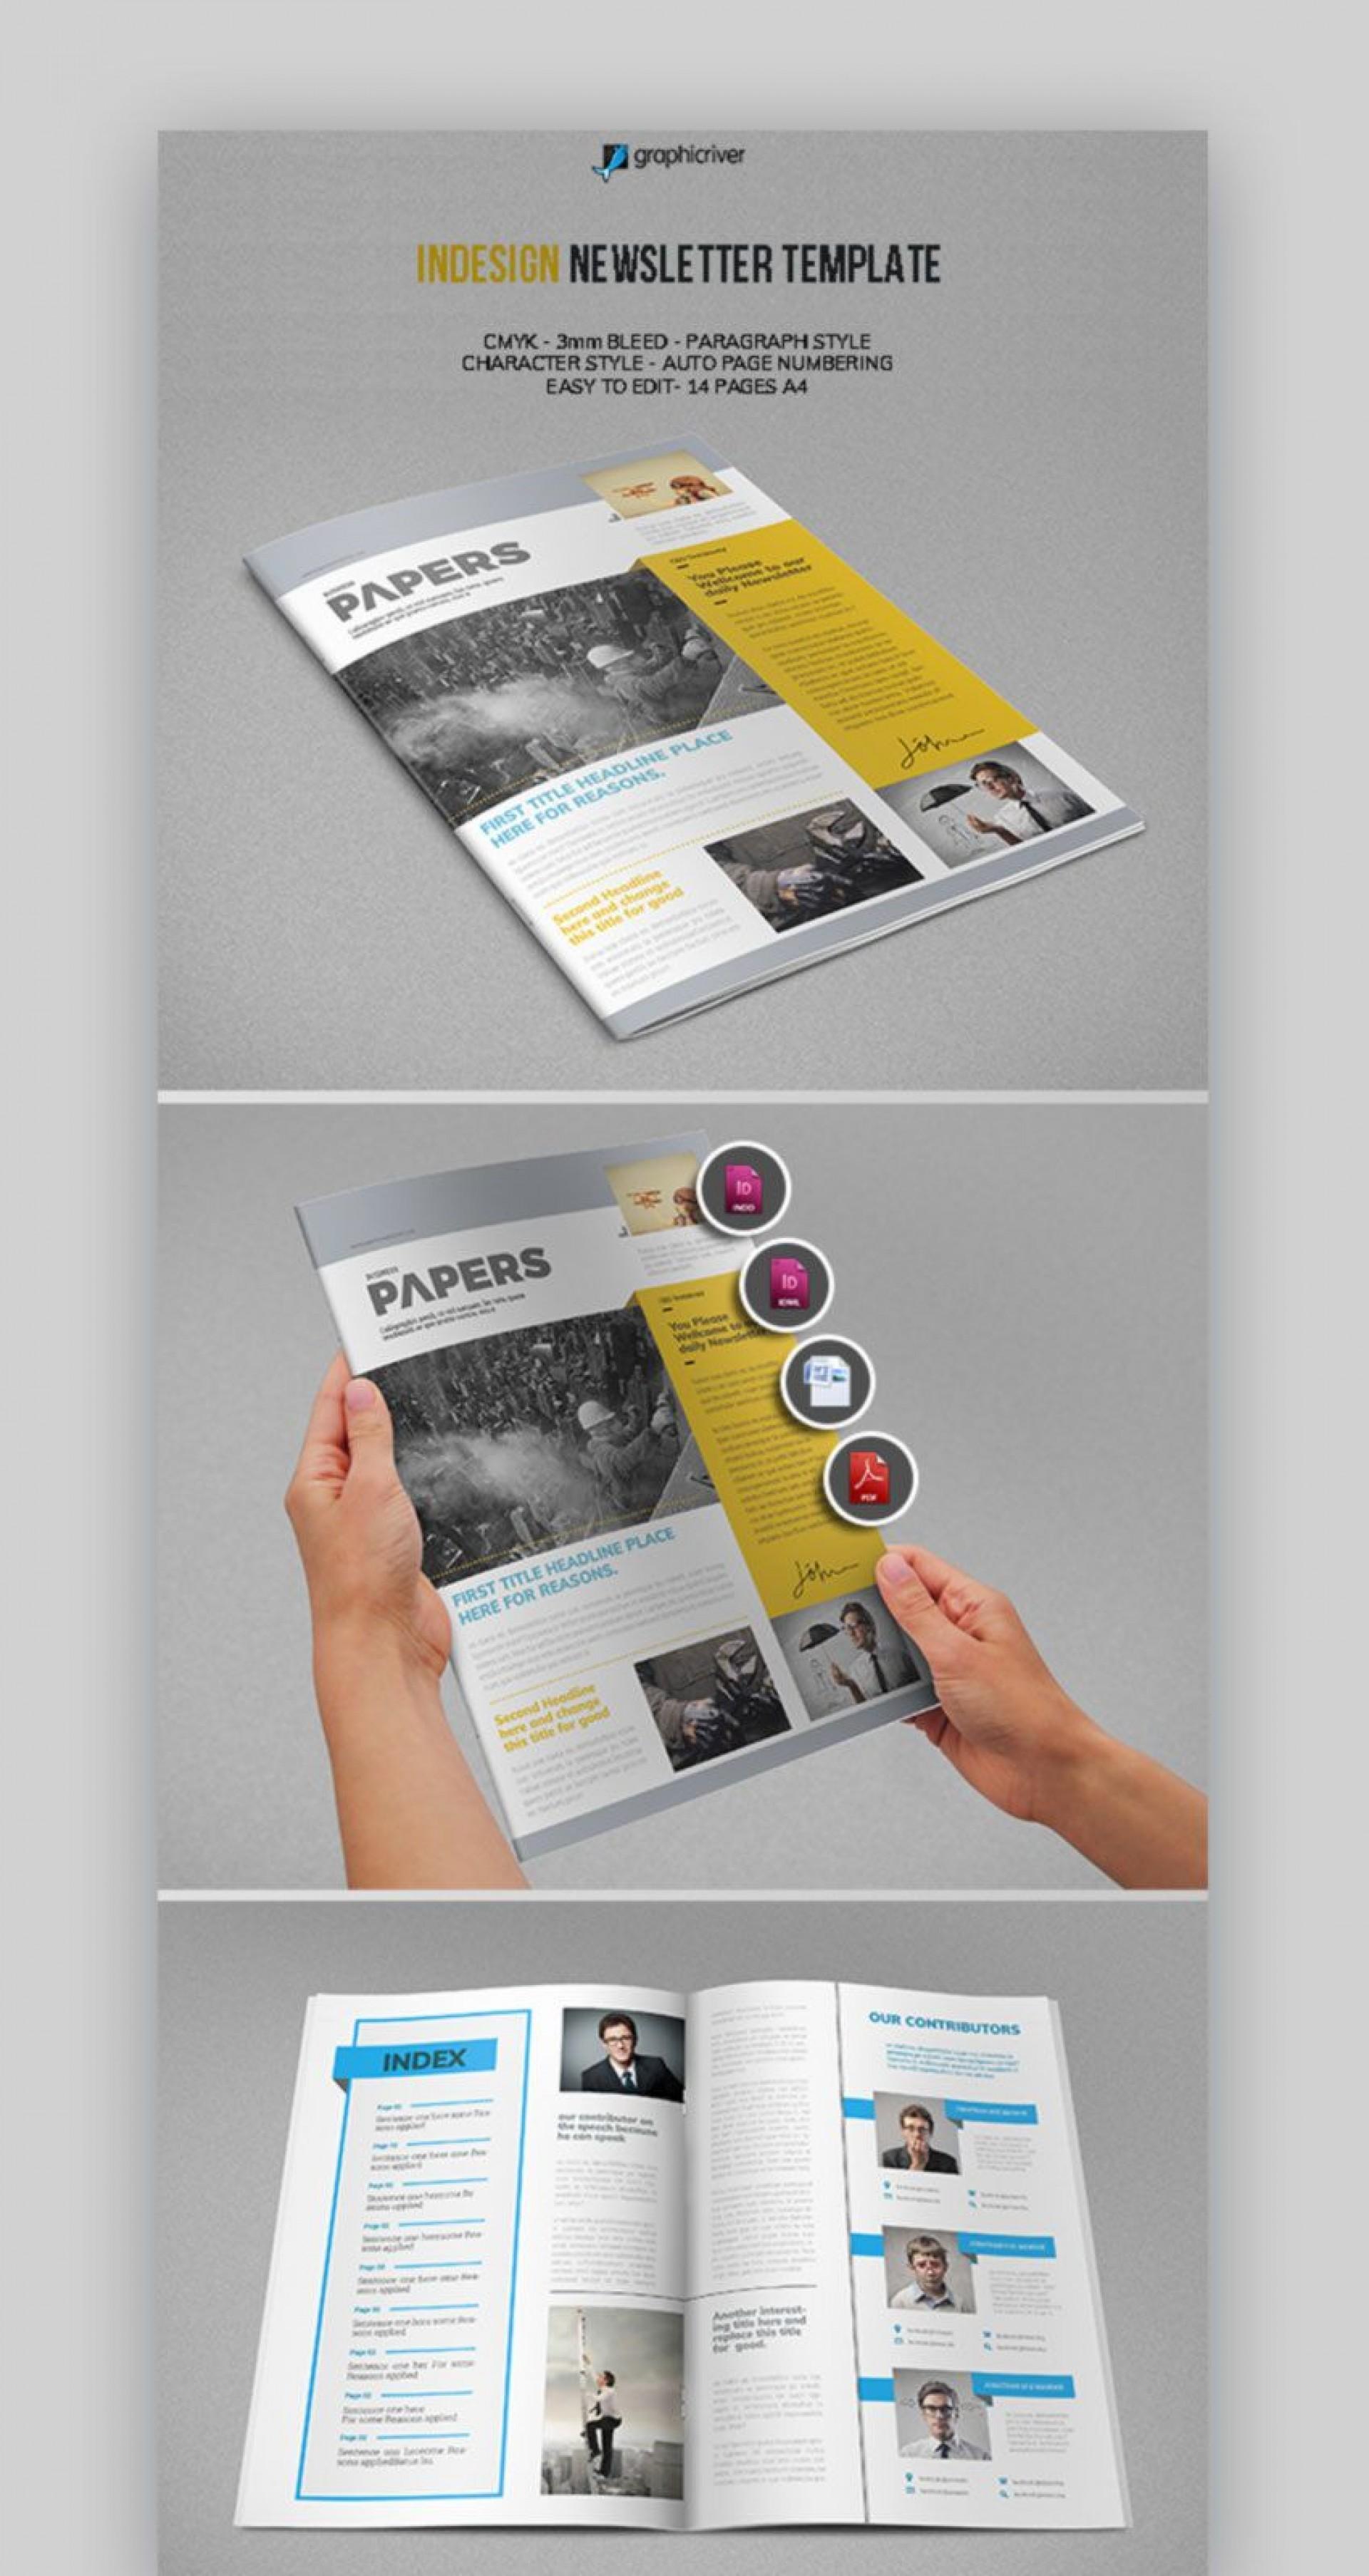 009 Beautiful Microsoft Publisher Newsletter Template Design  School Free Download1920